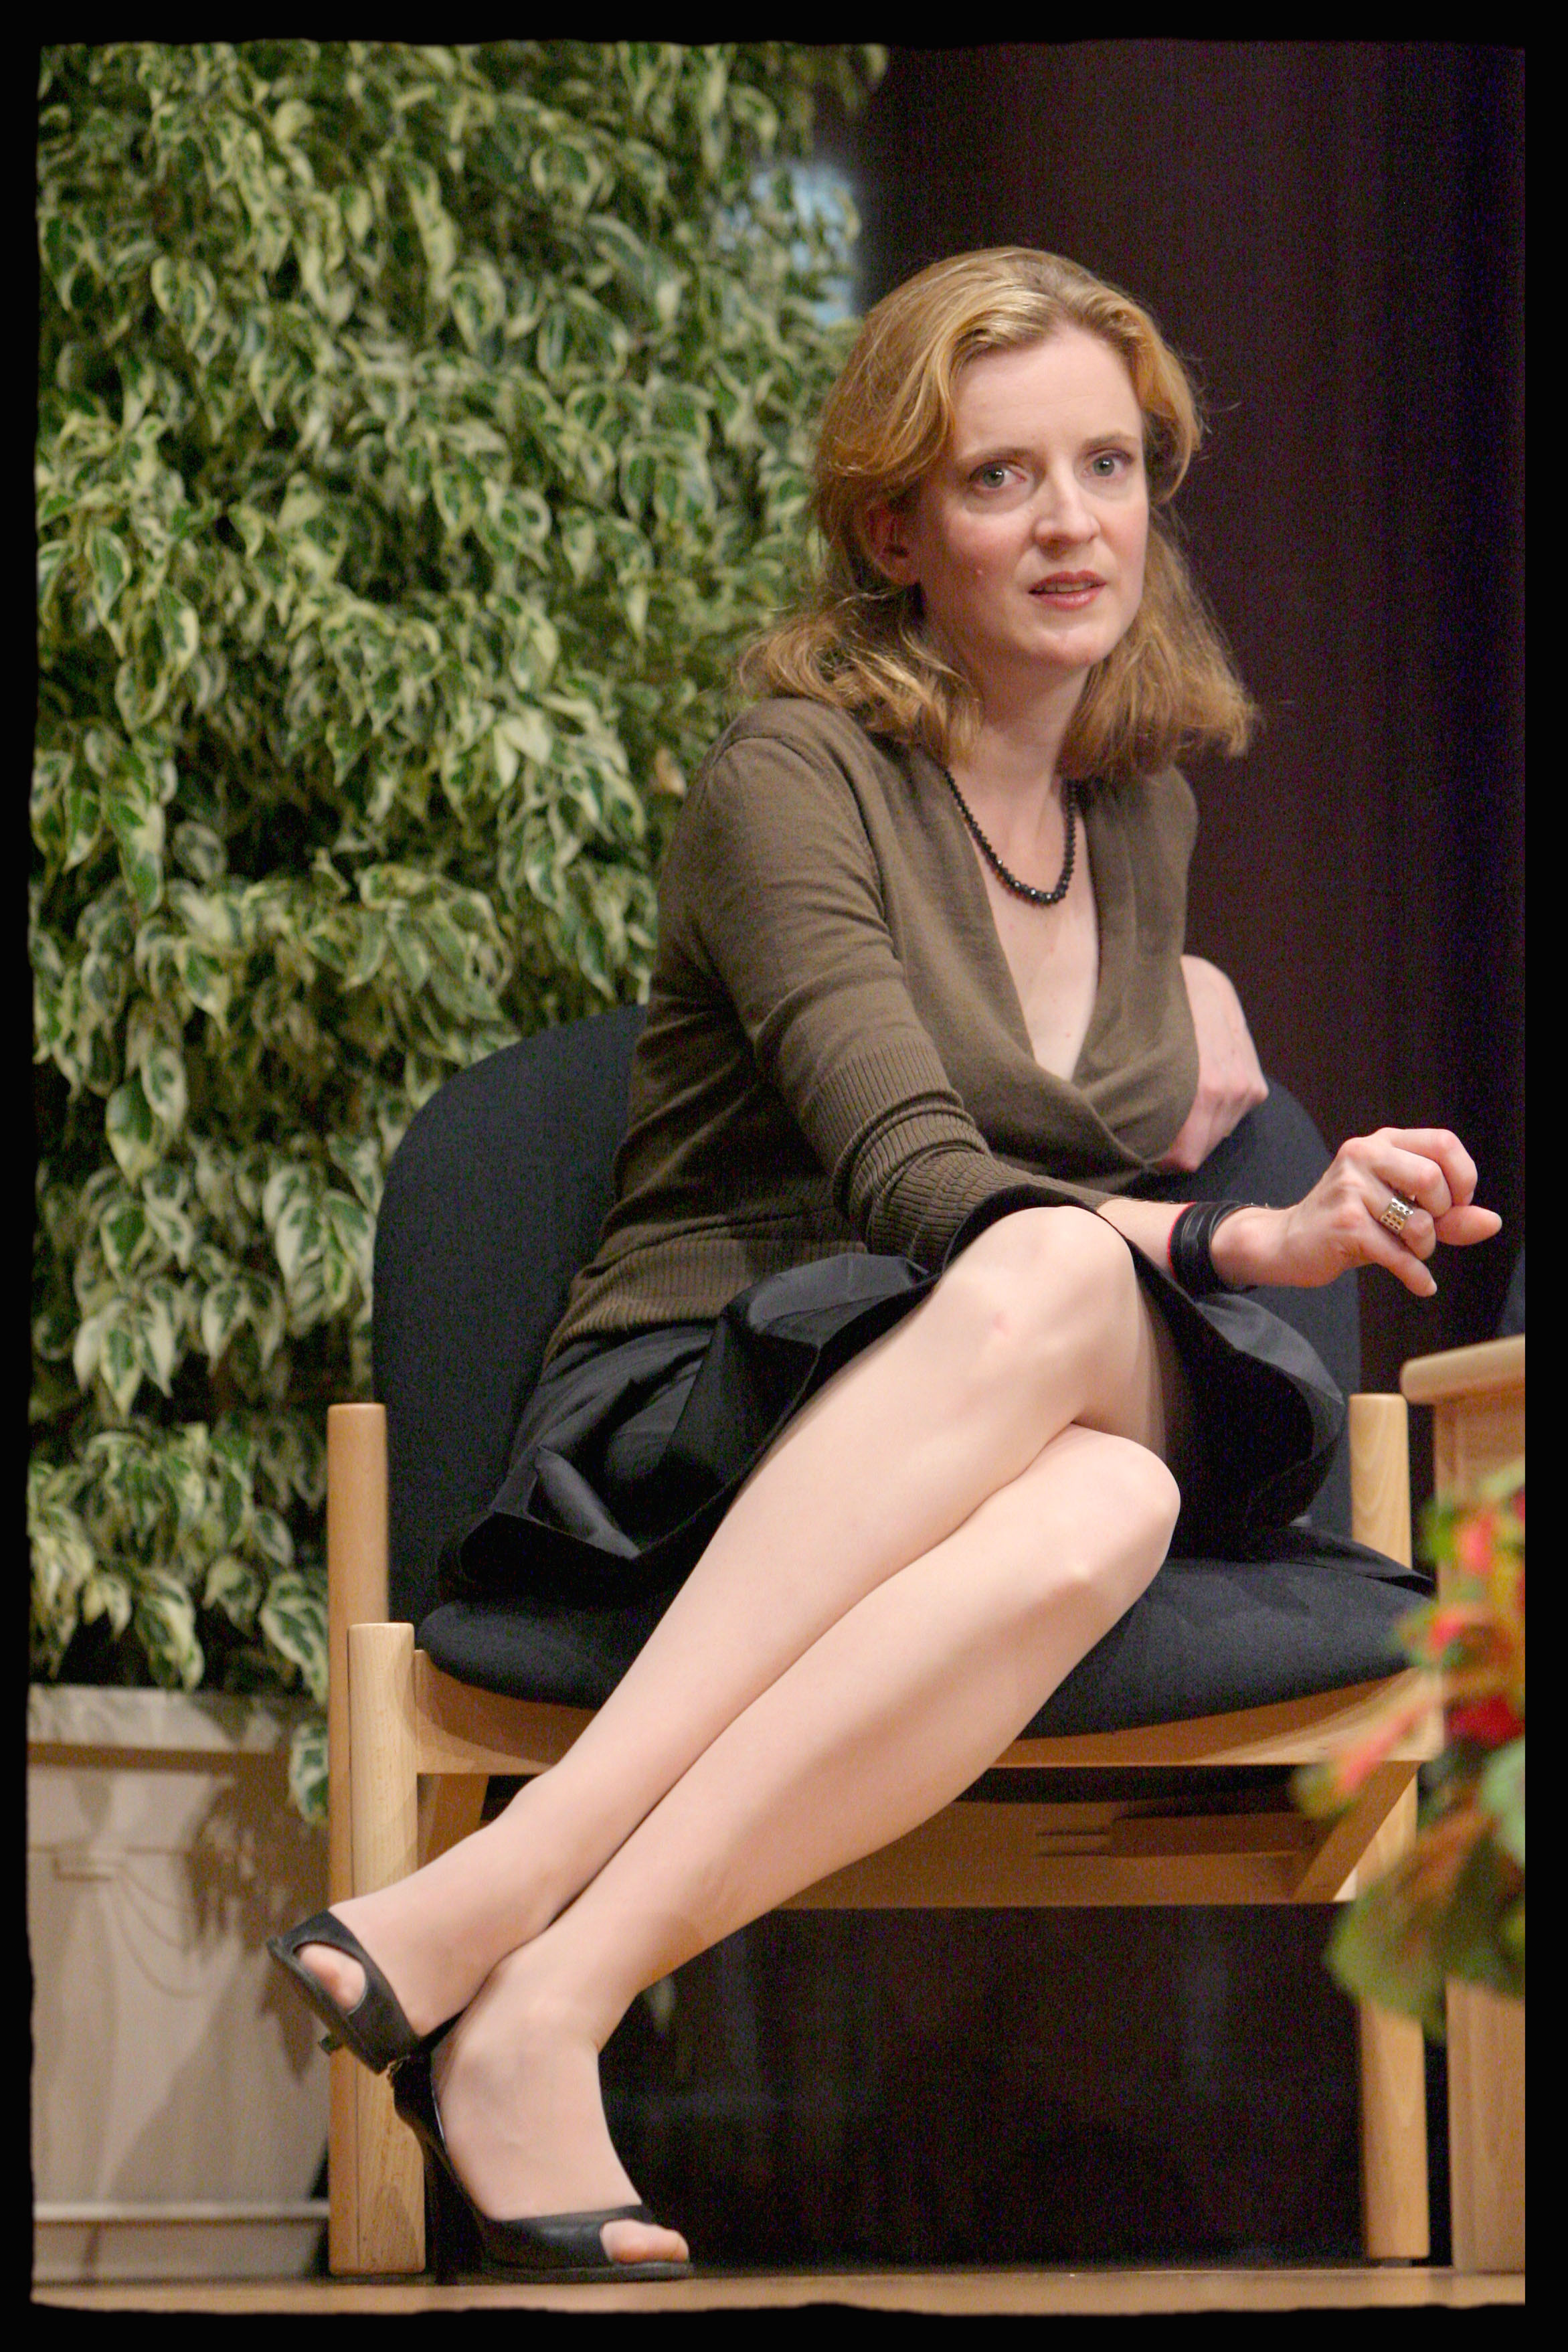 Nathalie-Kosciusko-Morizet-Feet-797101.jpg